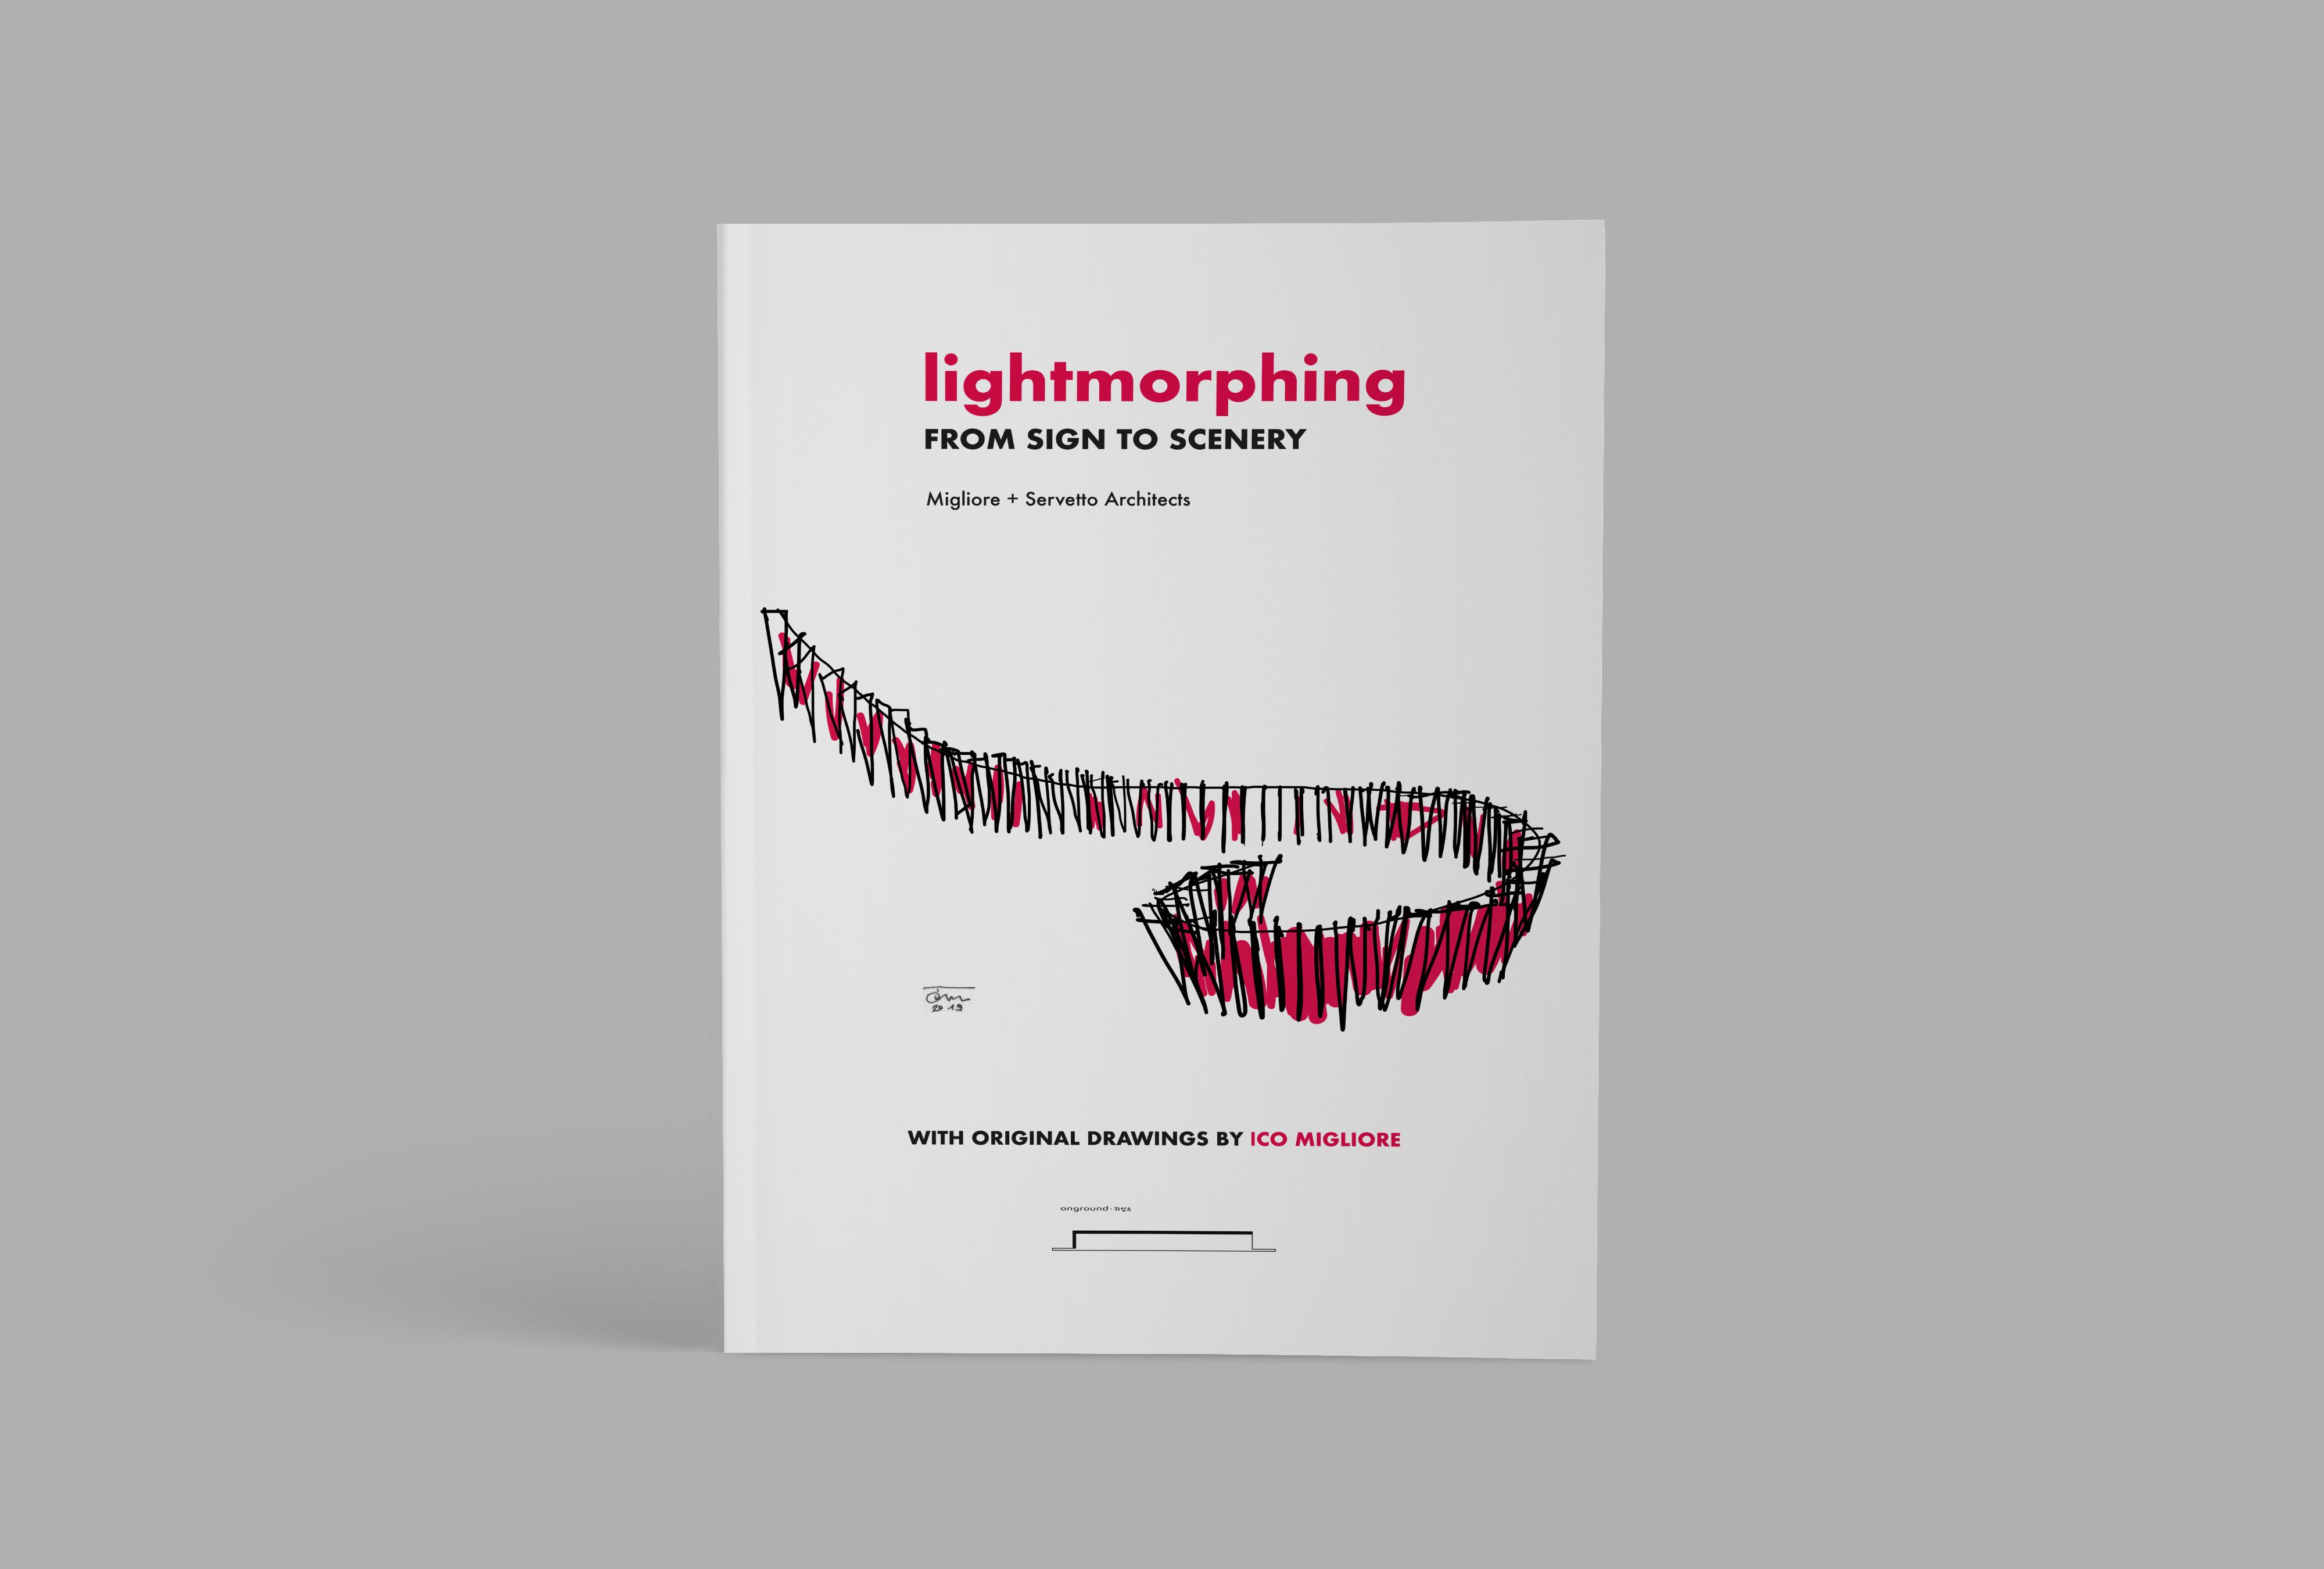 Lightmorphing catalogue